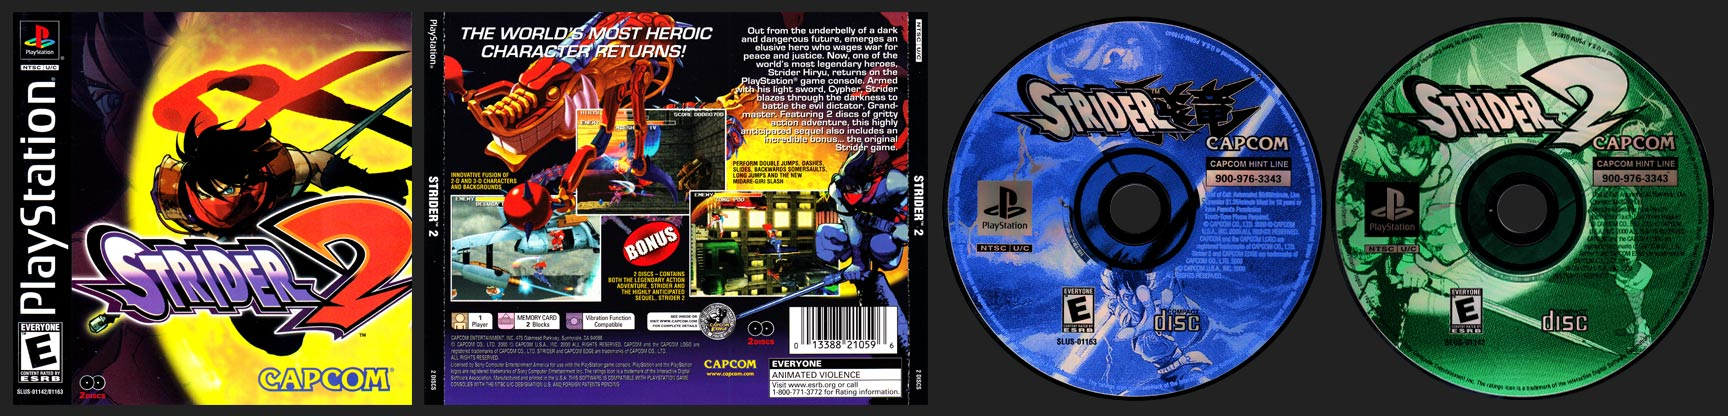 PSX PlayStation Strider 2